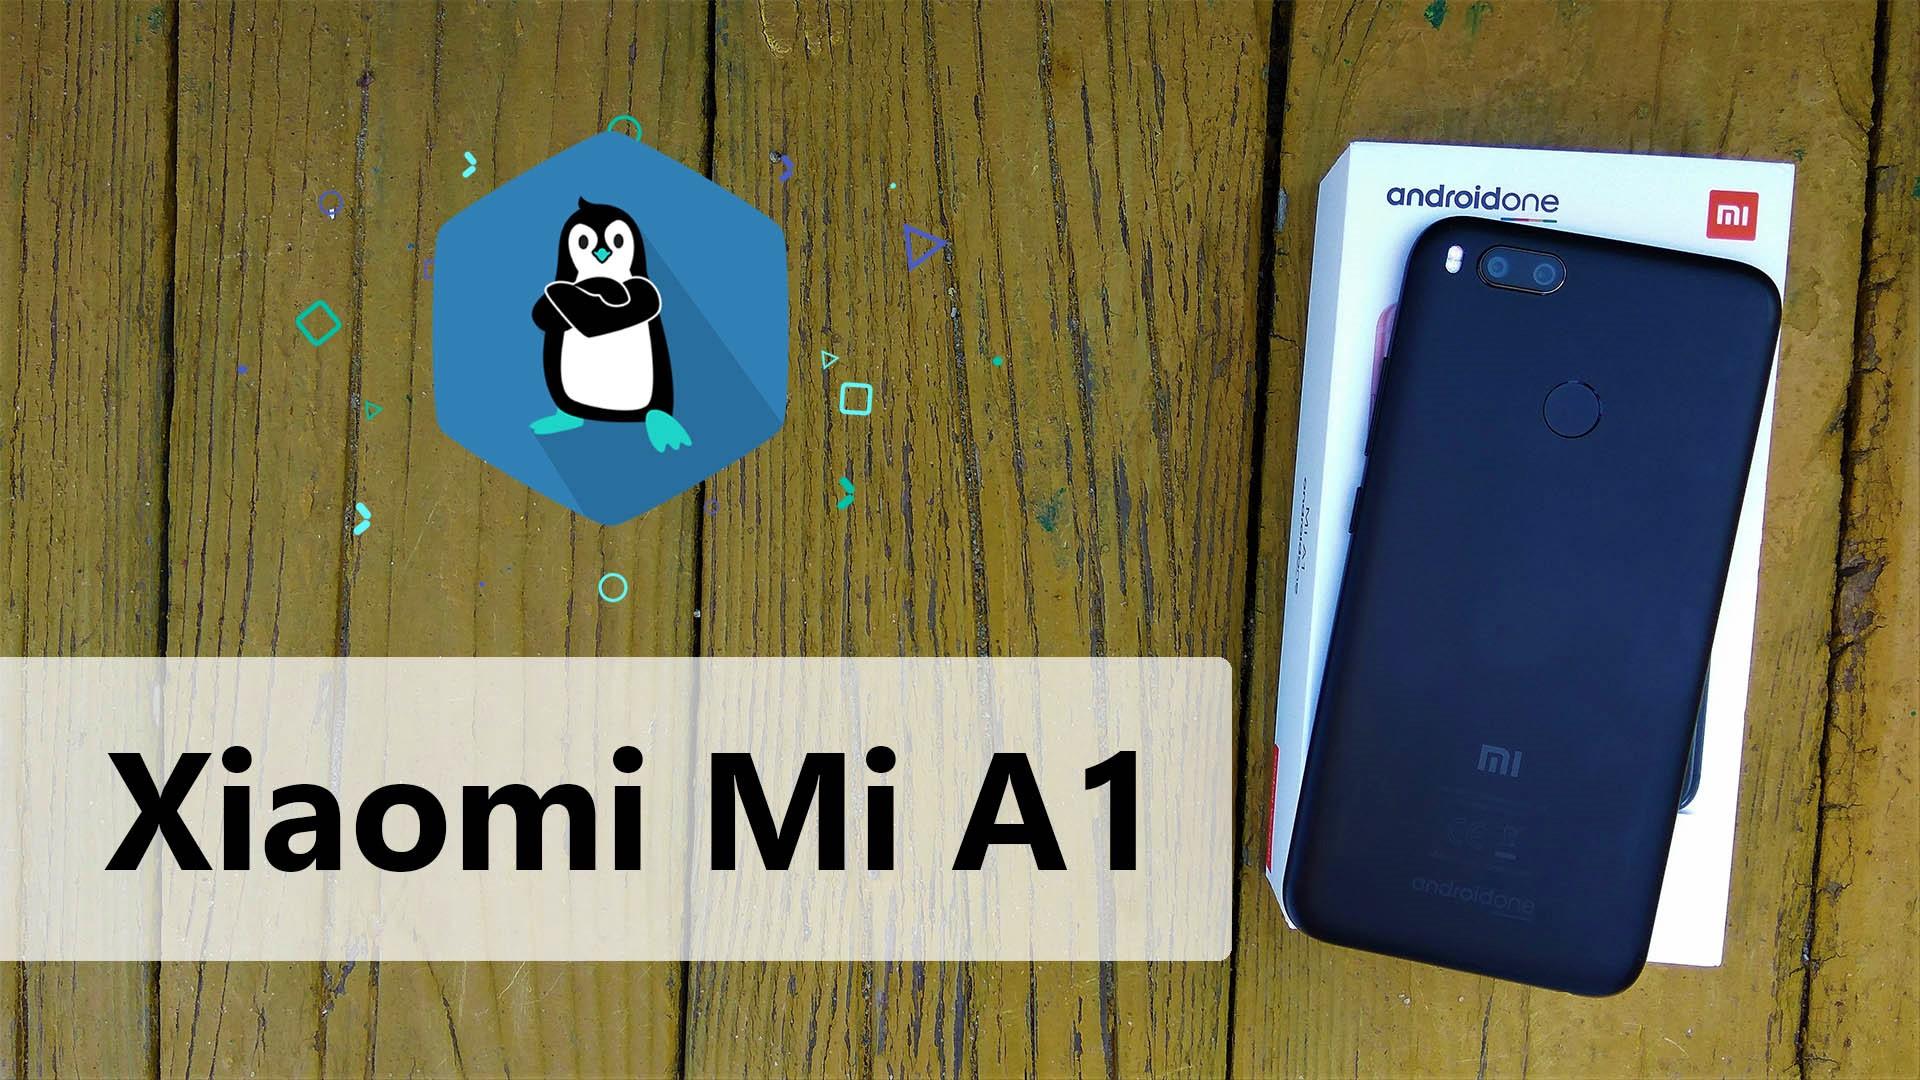 Xiaomi готує смартфони на Android One із функцією флагманів